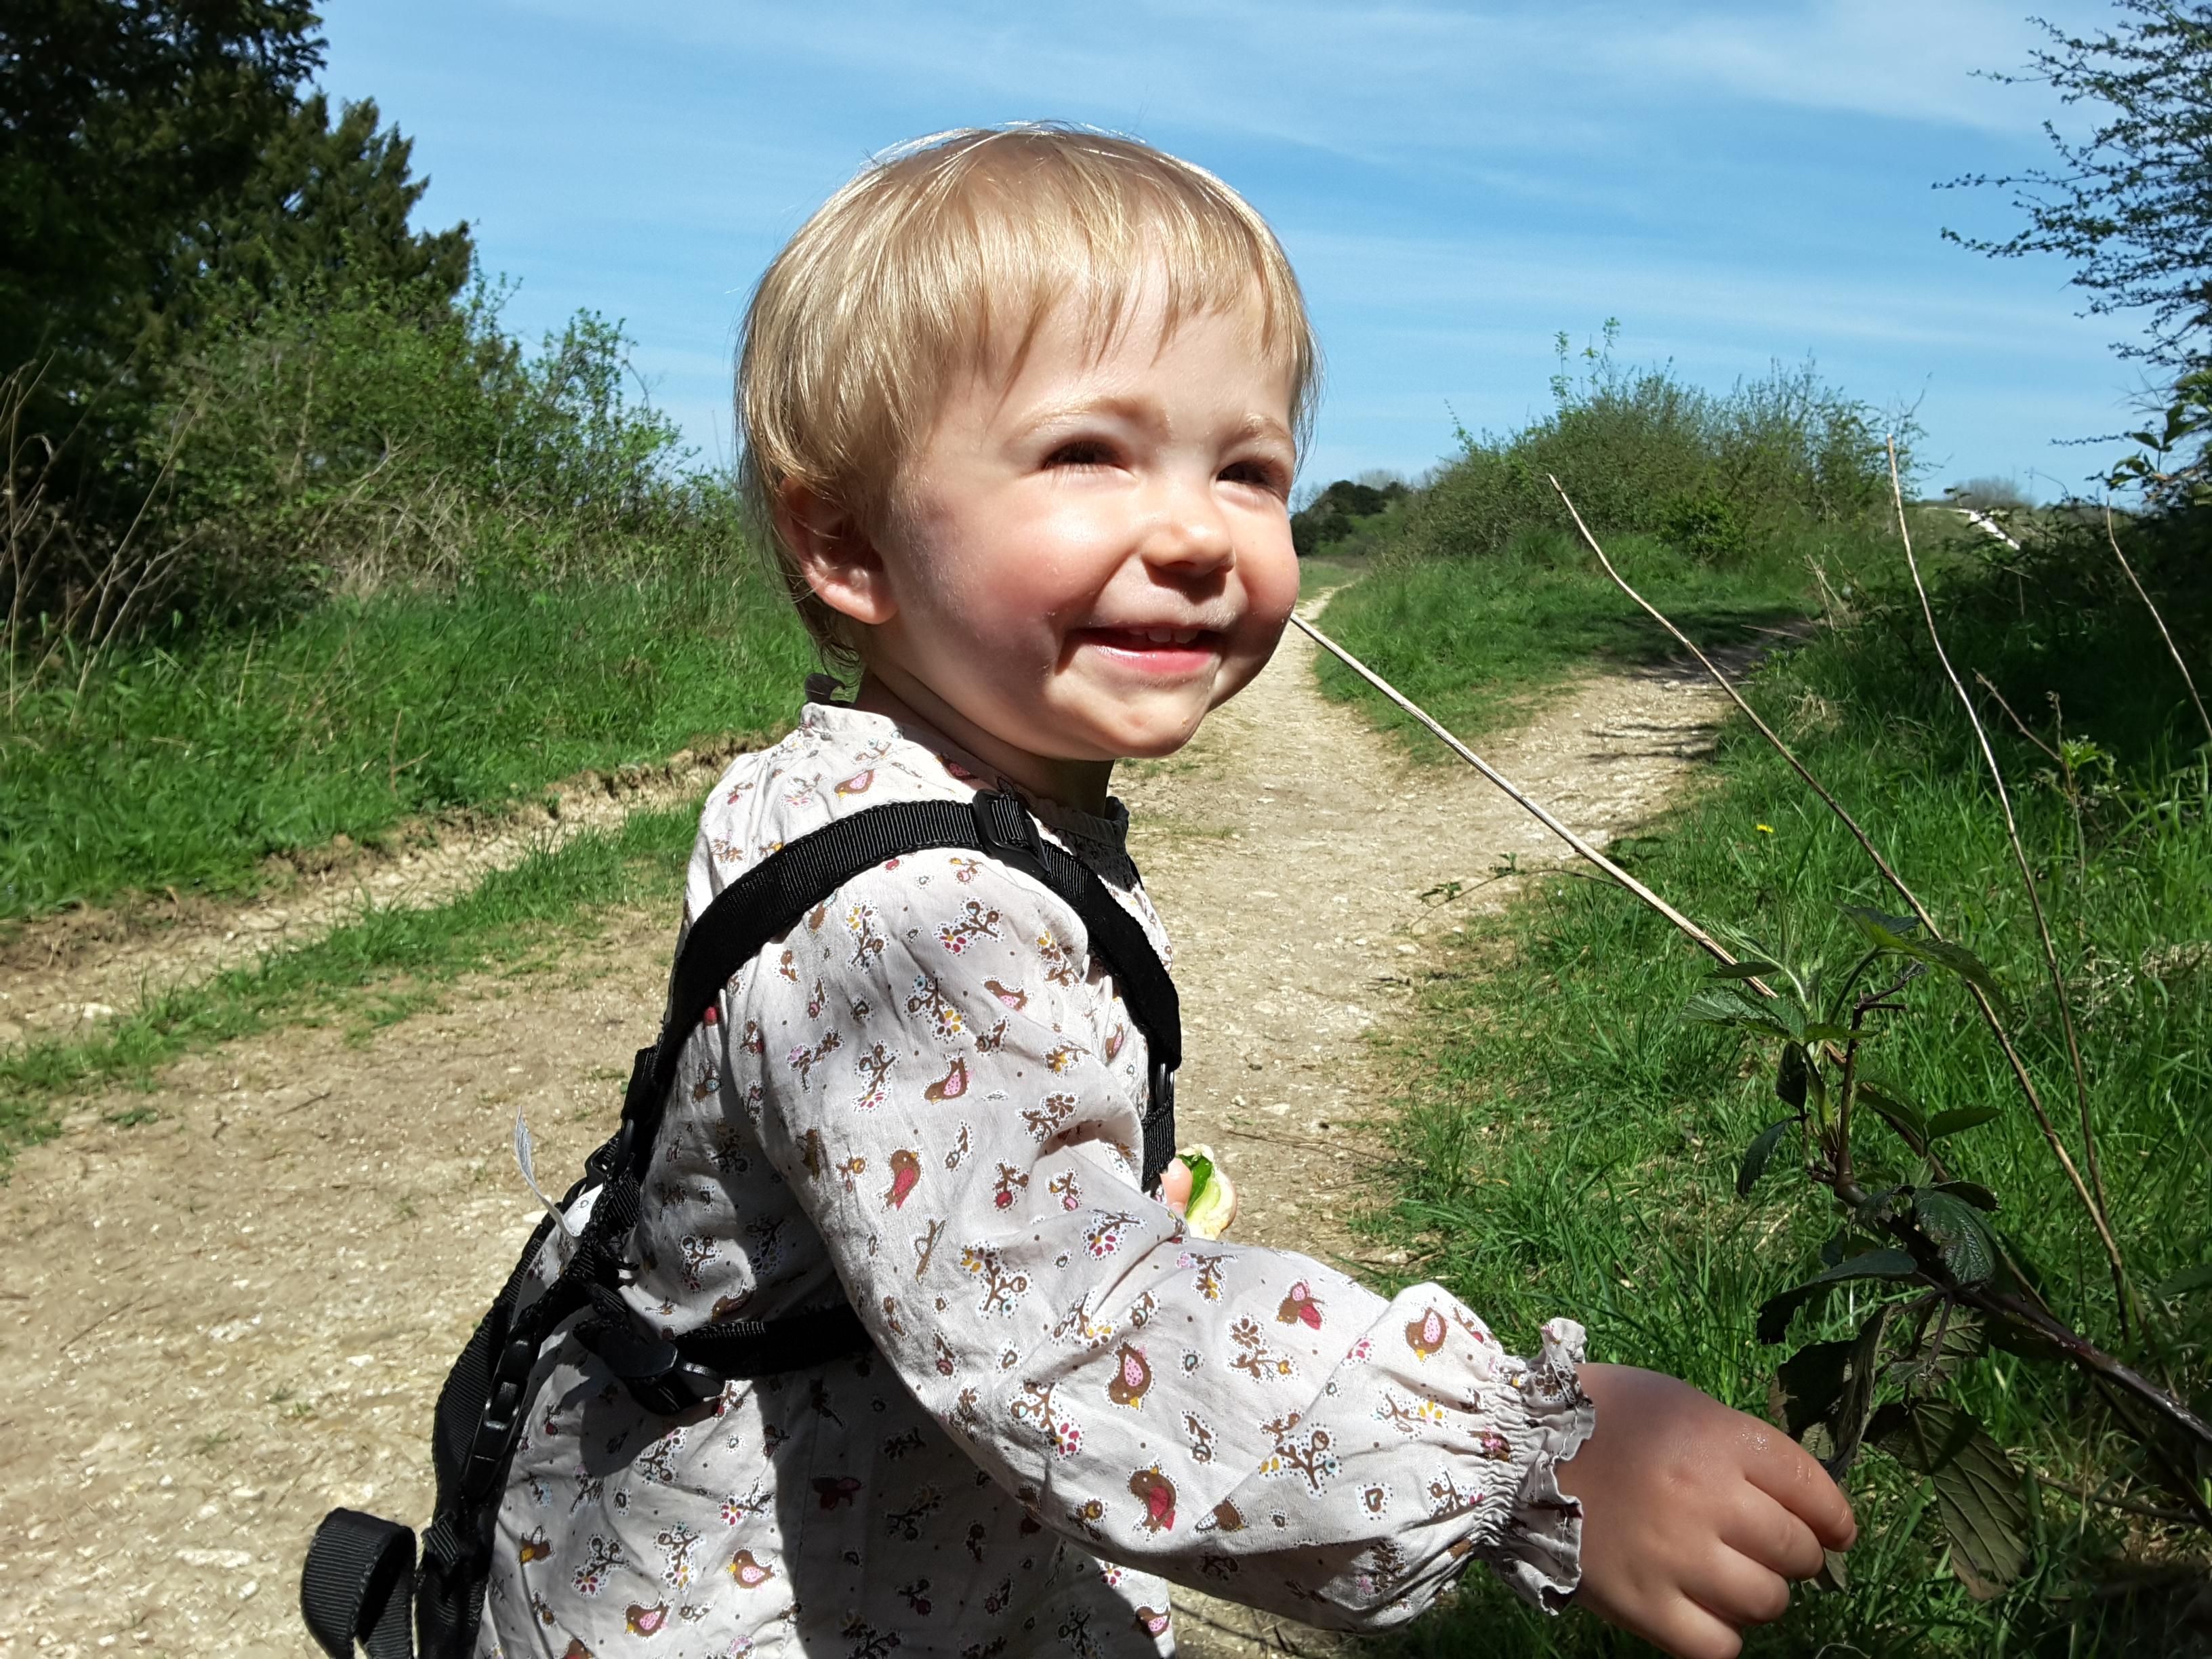 2016.05.08 - Kingley Vale National Nature Reserve - 09